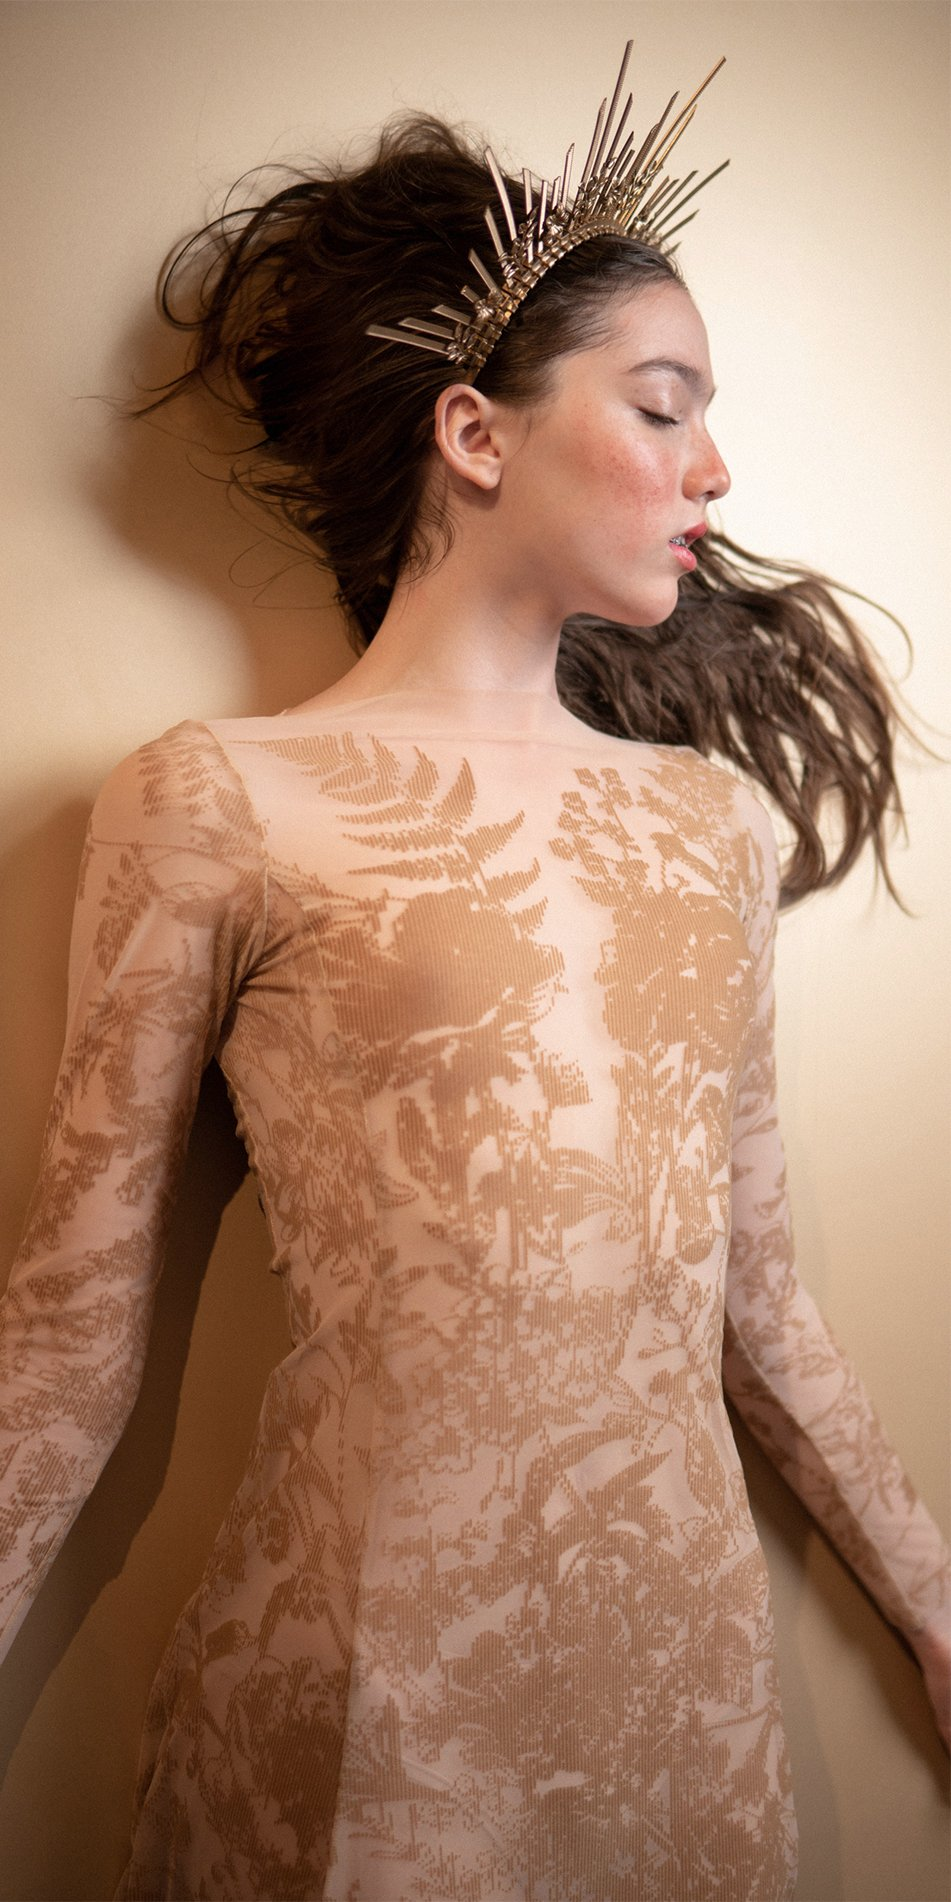 BLOSSOMS nude second skin flock print dress 10